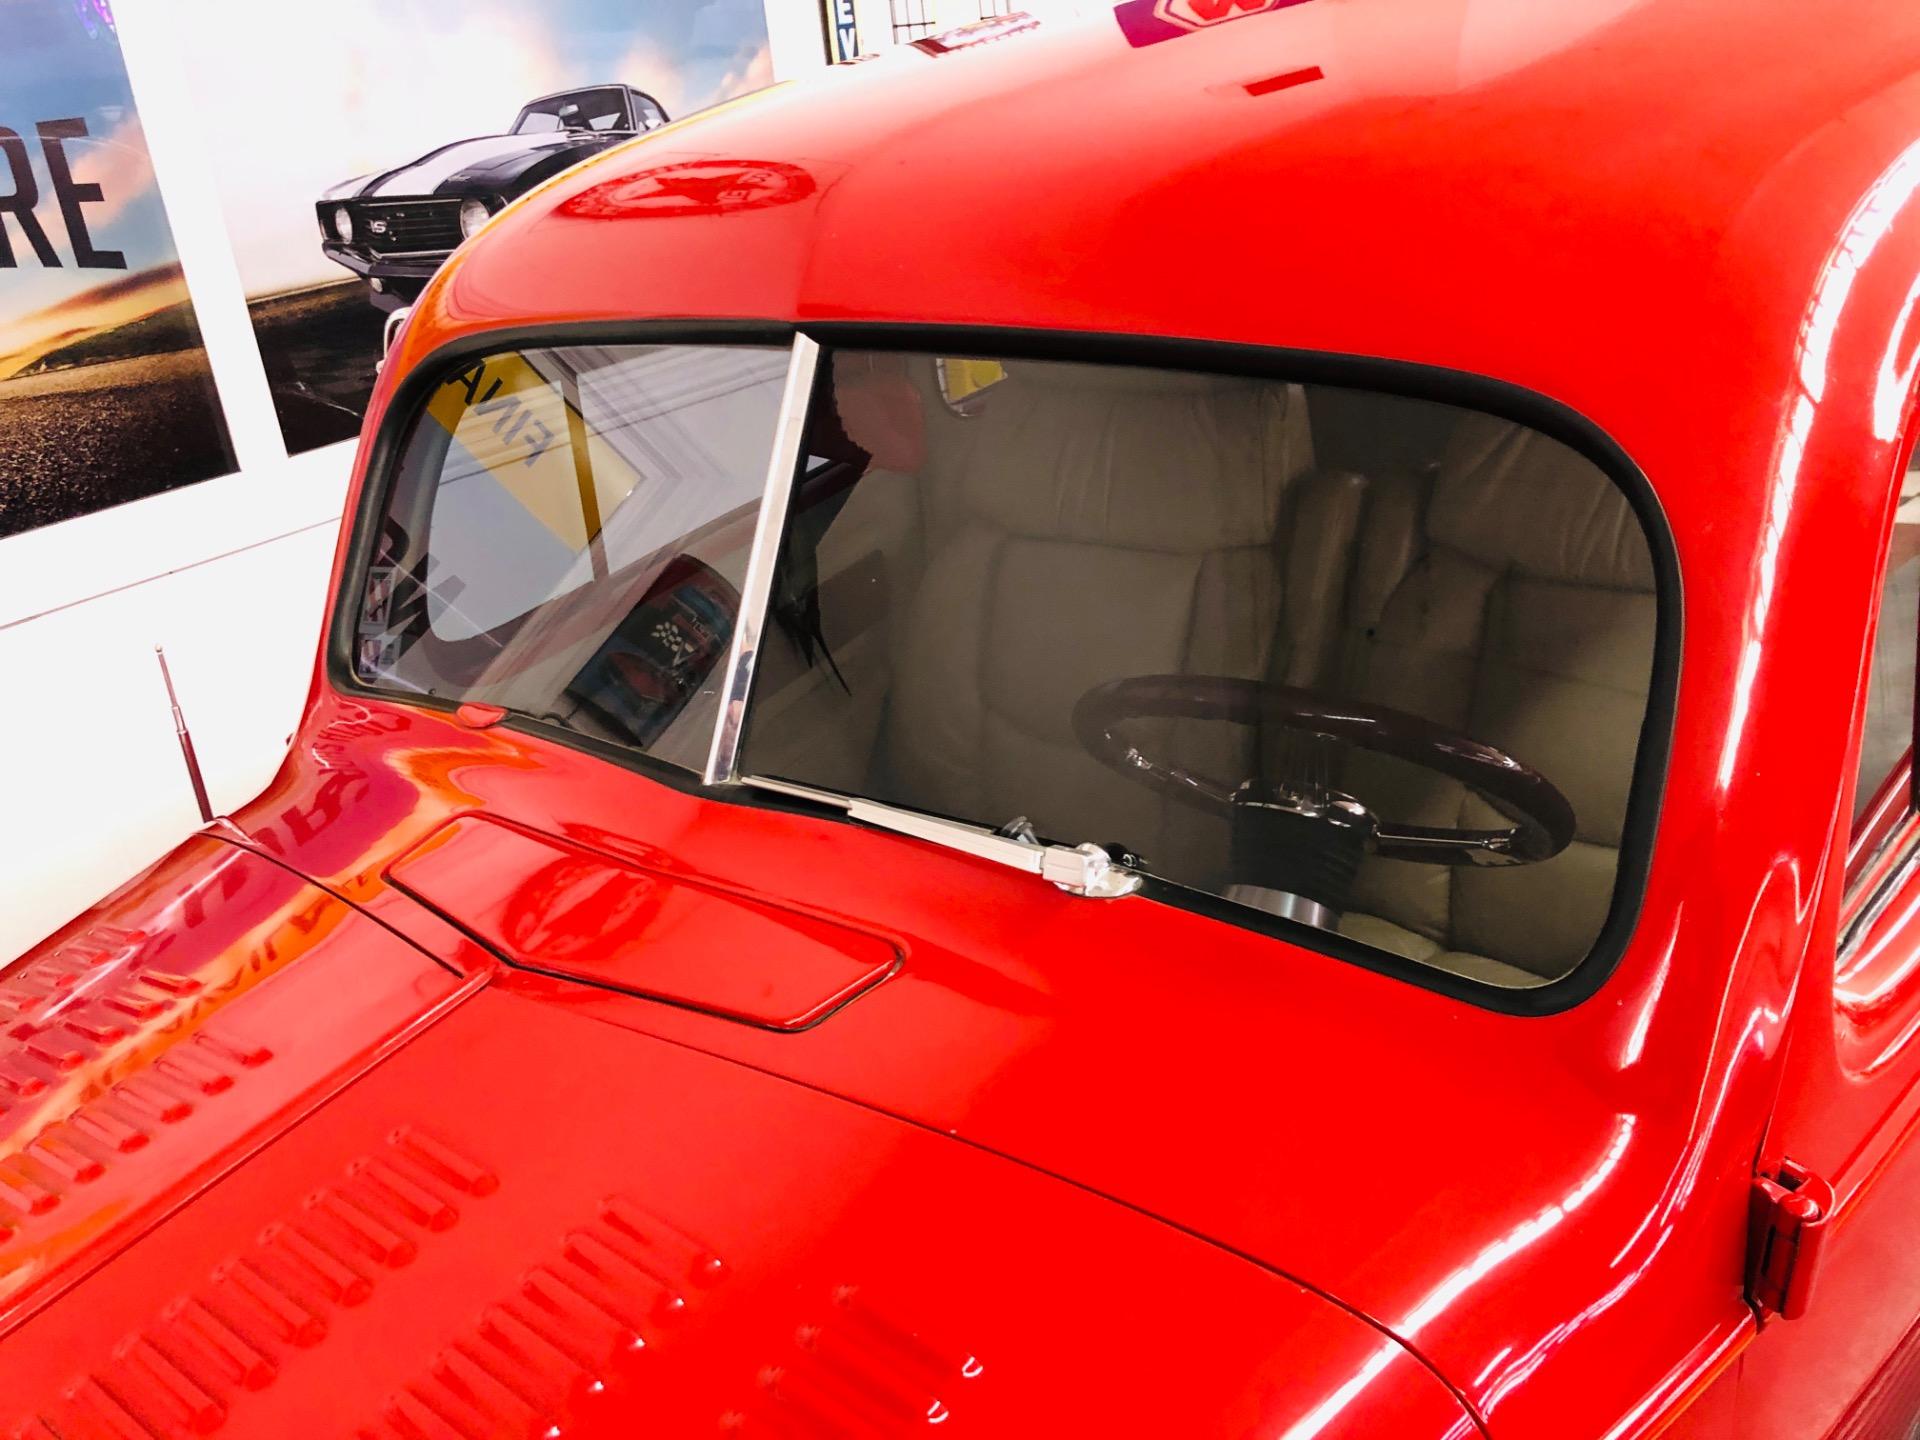 Used 1936 Chevrolet Hot Rod / Street Rod - 2 DOOR SEDAN - VERY RELIABLE - CUSTOM COCA-COLA TRAILER - SEE VIDEO   Mundelein, IL